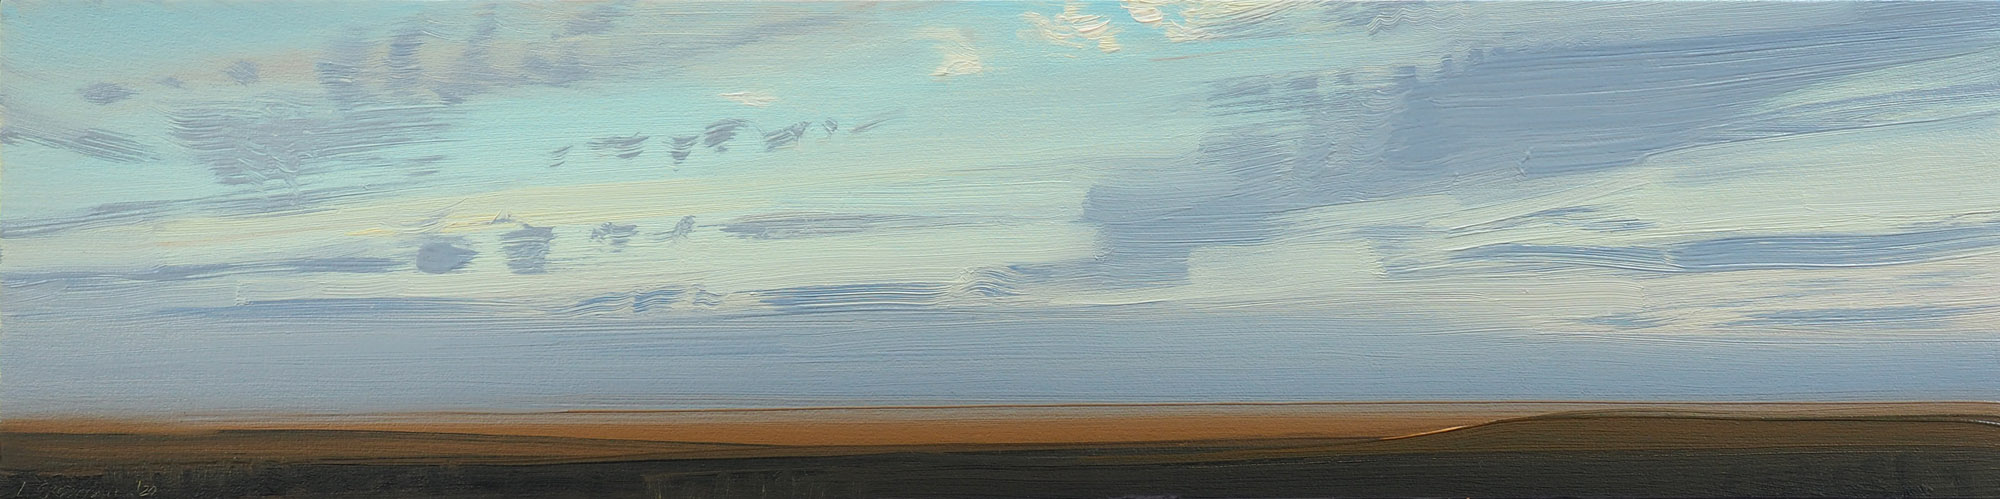 End of Winter 2 by  Lisa Grossman - Masterpiece Online